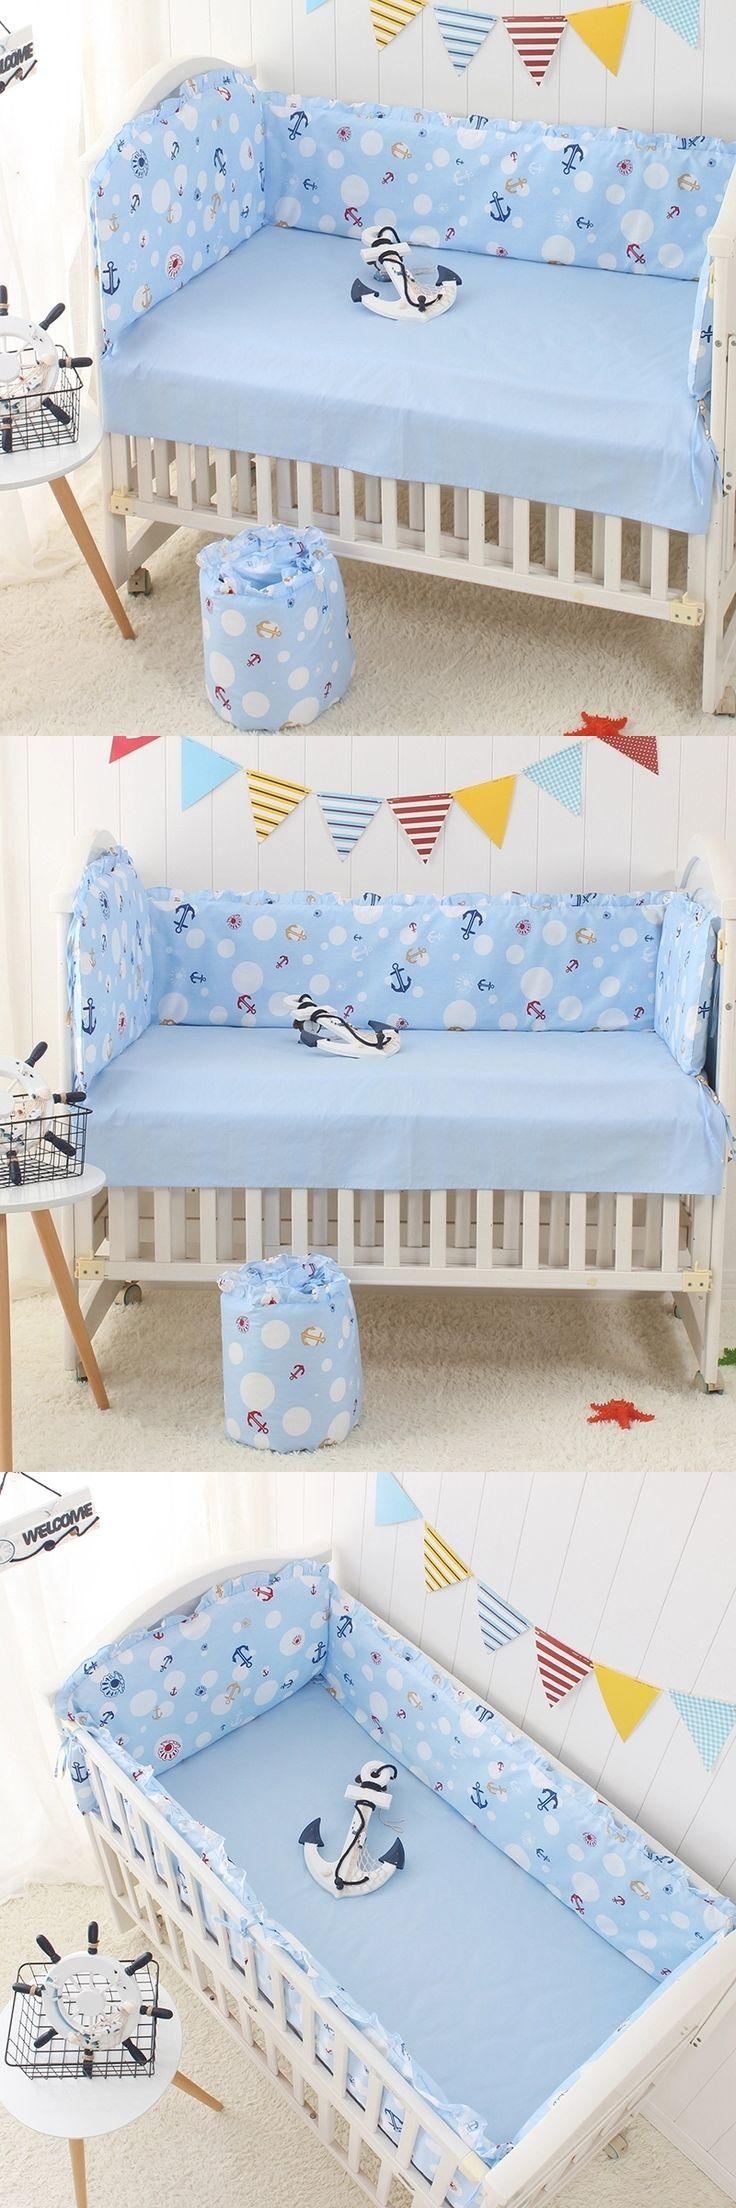 Multi Colours 5 pcs/set Baby Crib Bumper Sets Nursery,Cartoon Toddler Bedding for Baby Cot Set Bumper Sheet,Protector De Cuna